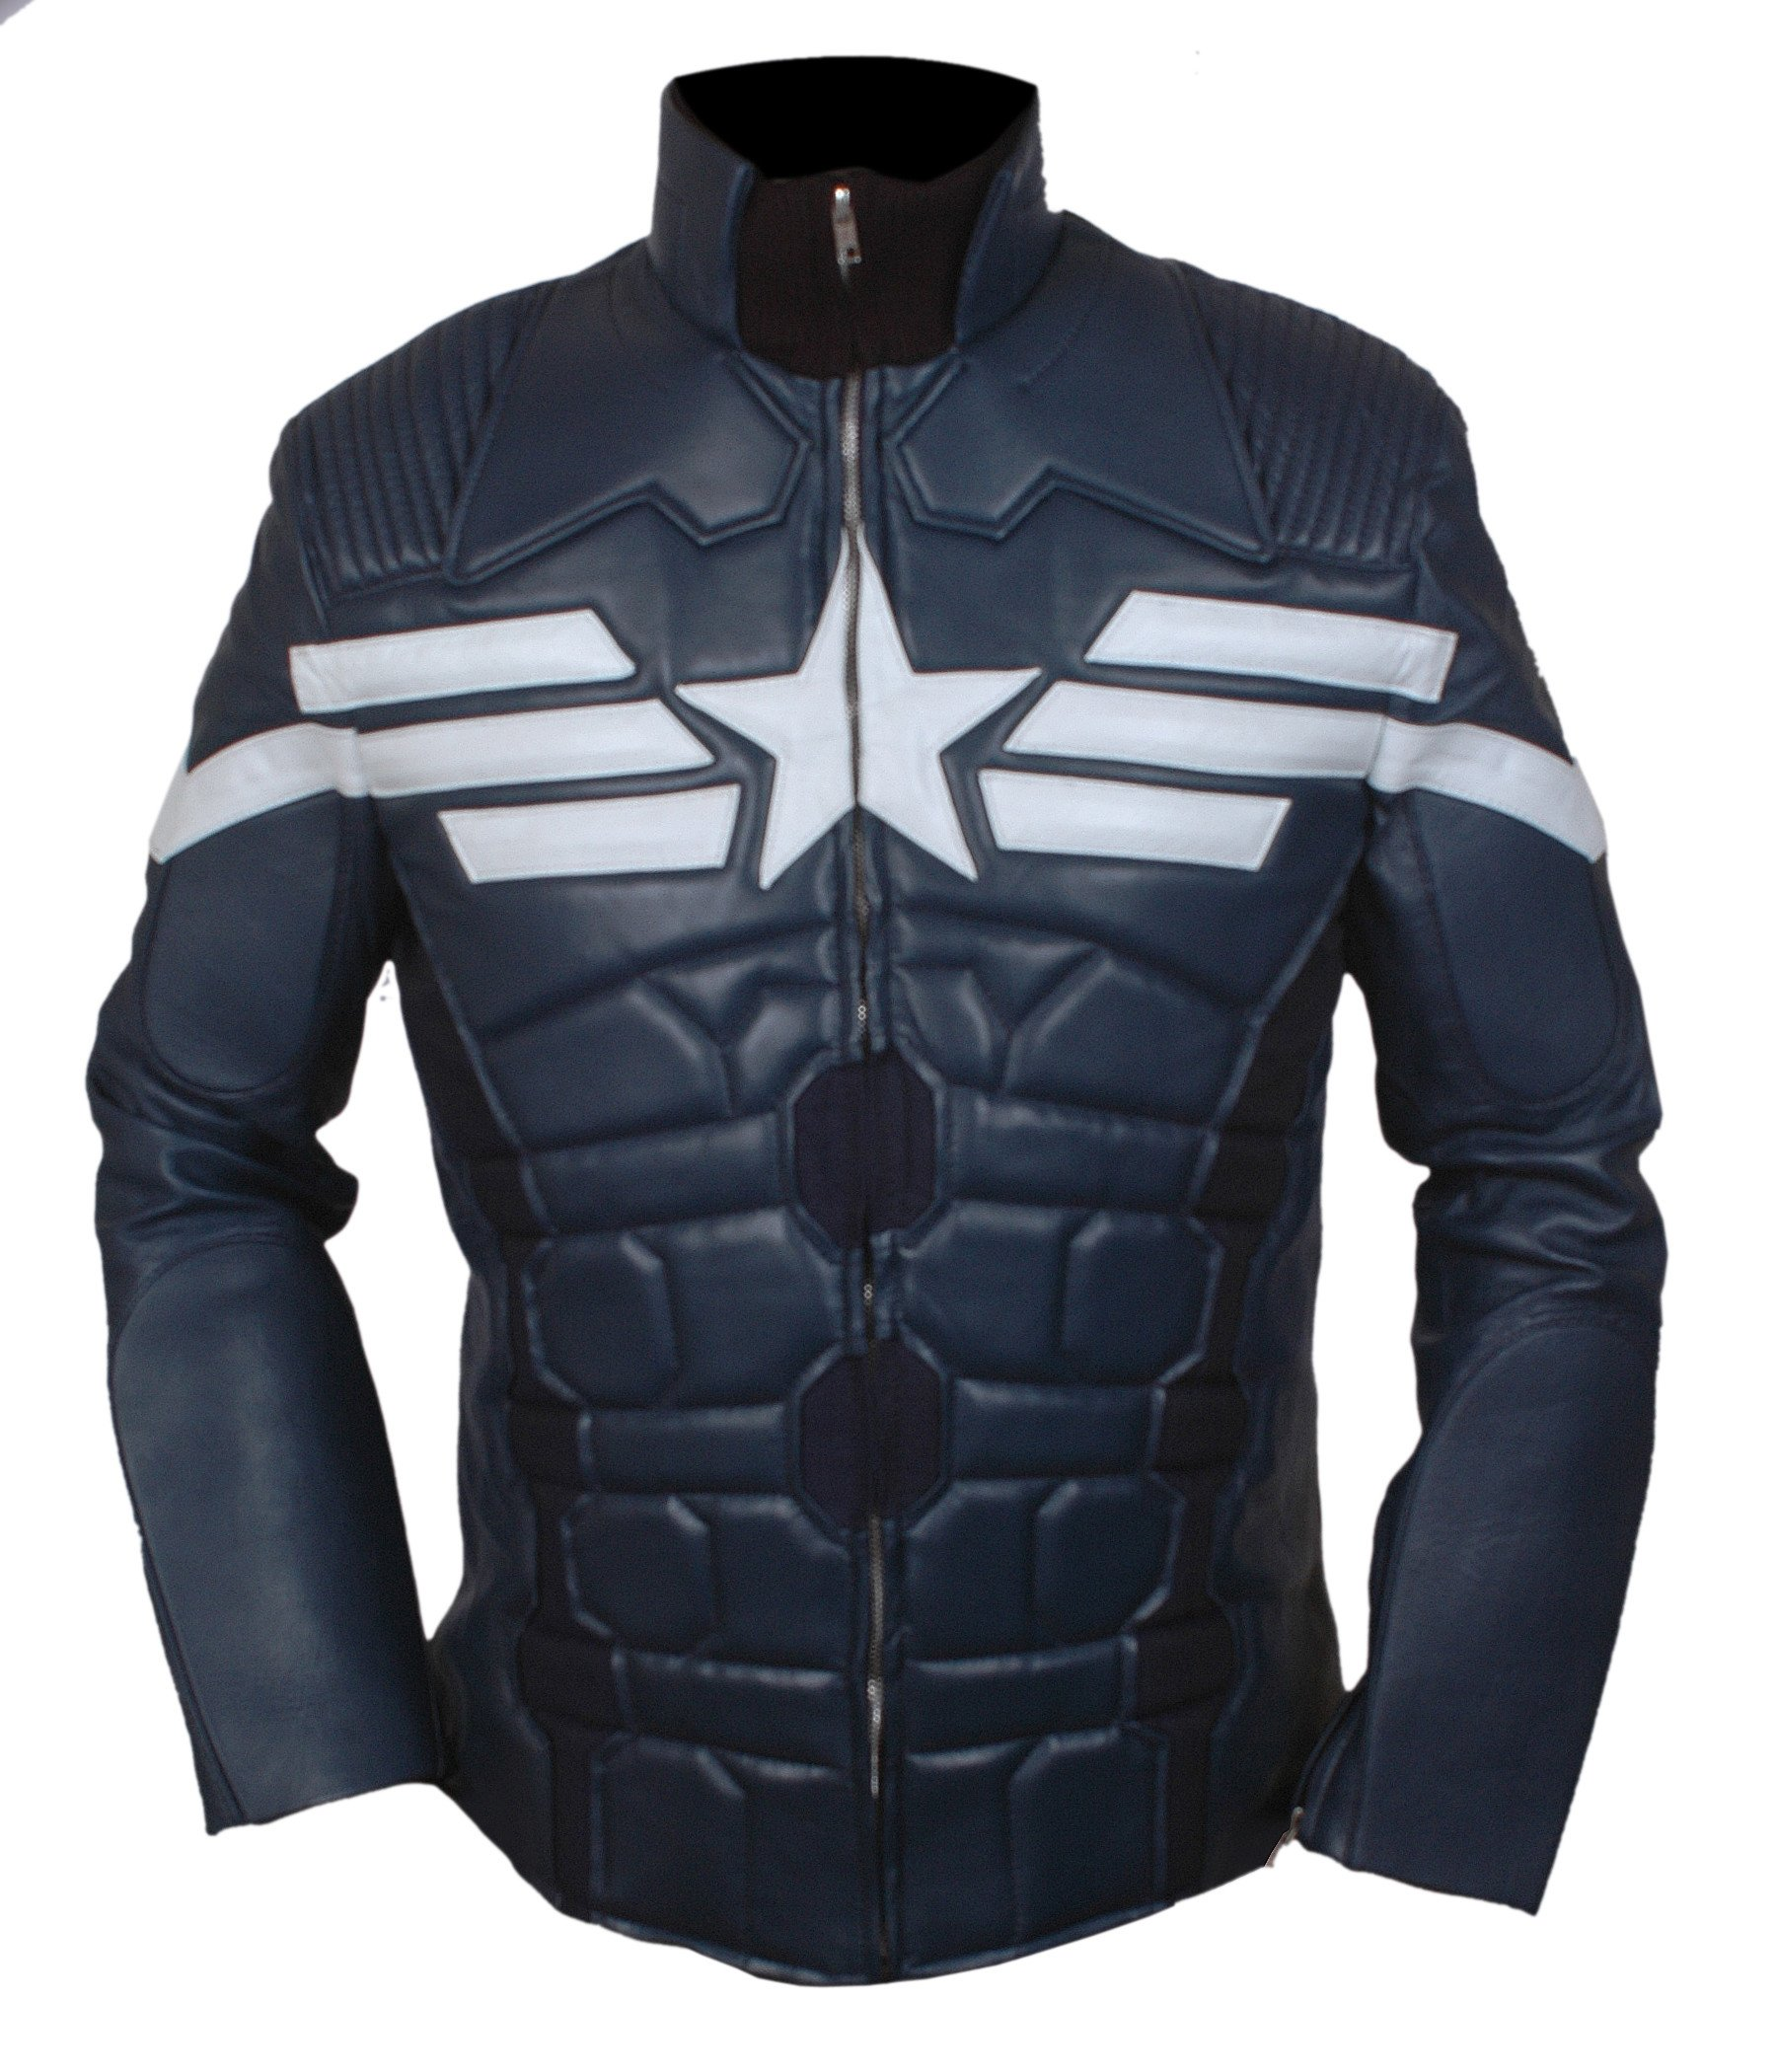 F&H Boy's Captain America Winter Soldier Jacket XL Blue by Flesh & Hide